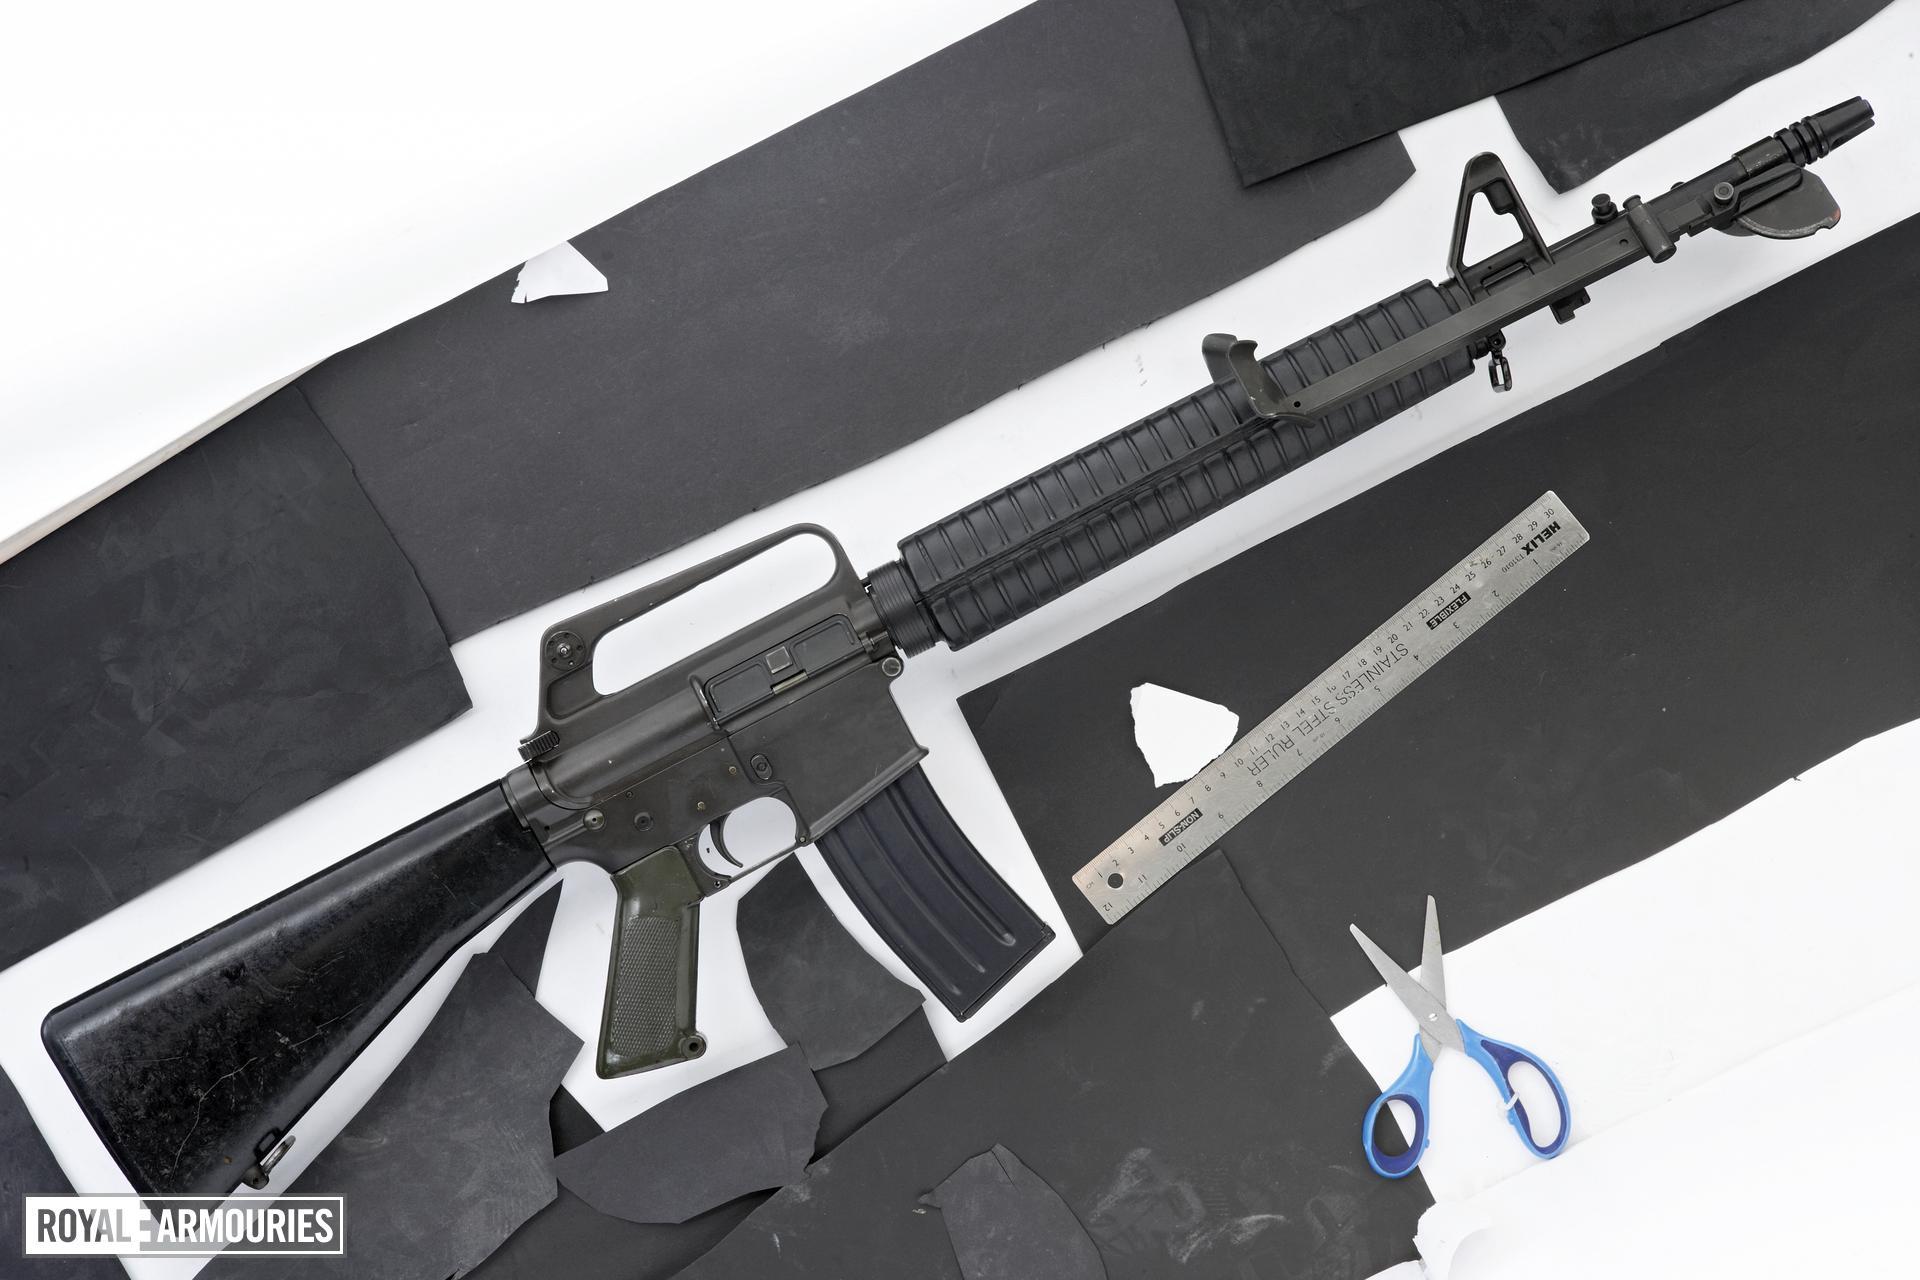 Centrefire automatic rifle - Colt Armalite AR-15 Model 01